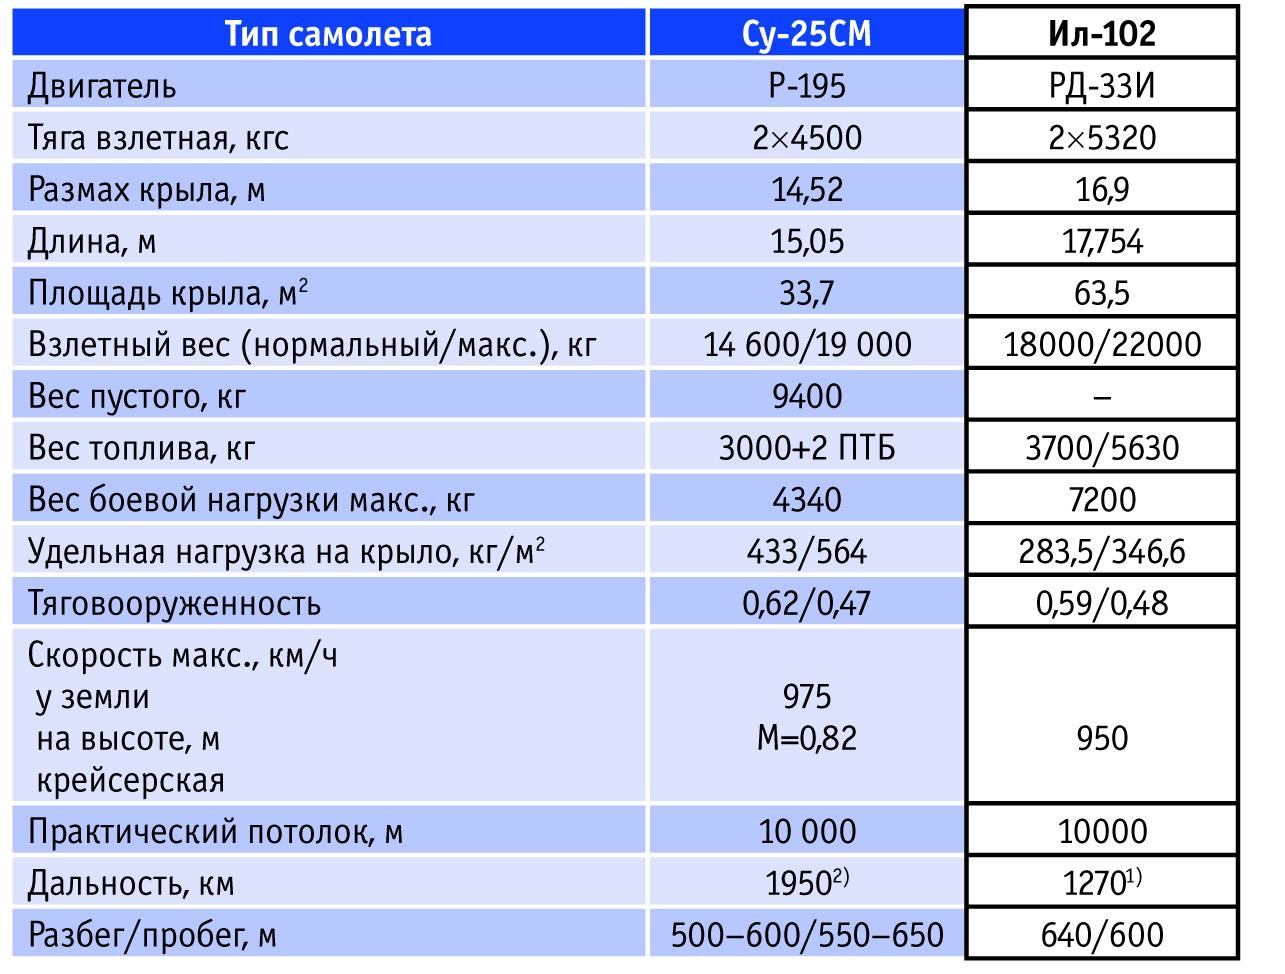 Сравнение характеристик Су-25СМ и Ил-102. Источник: Авиапанорама.